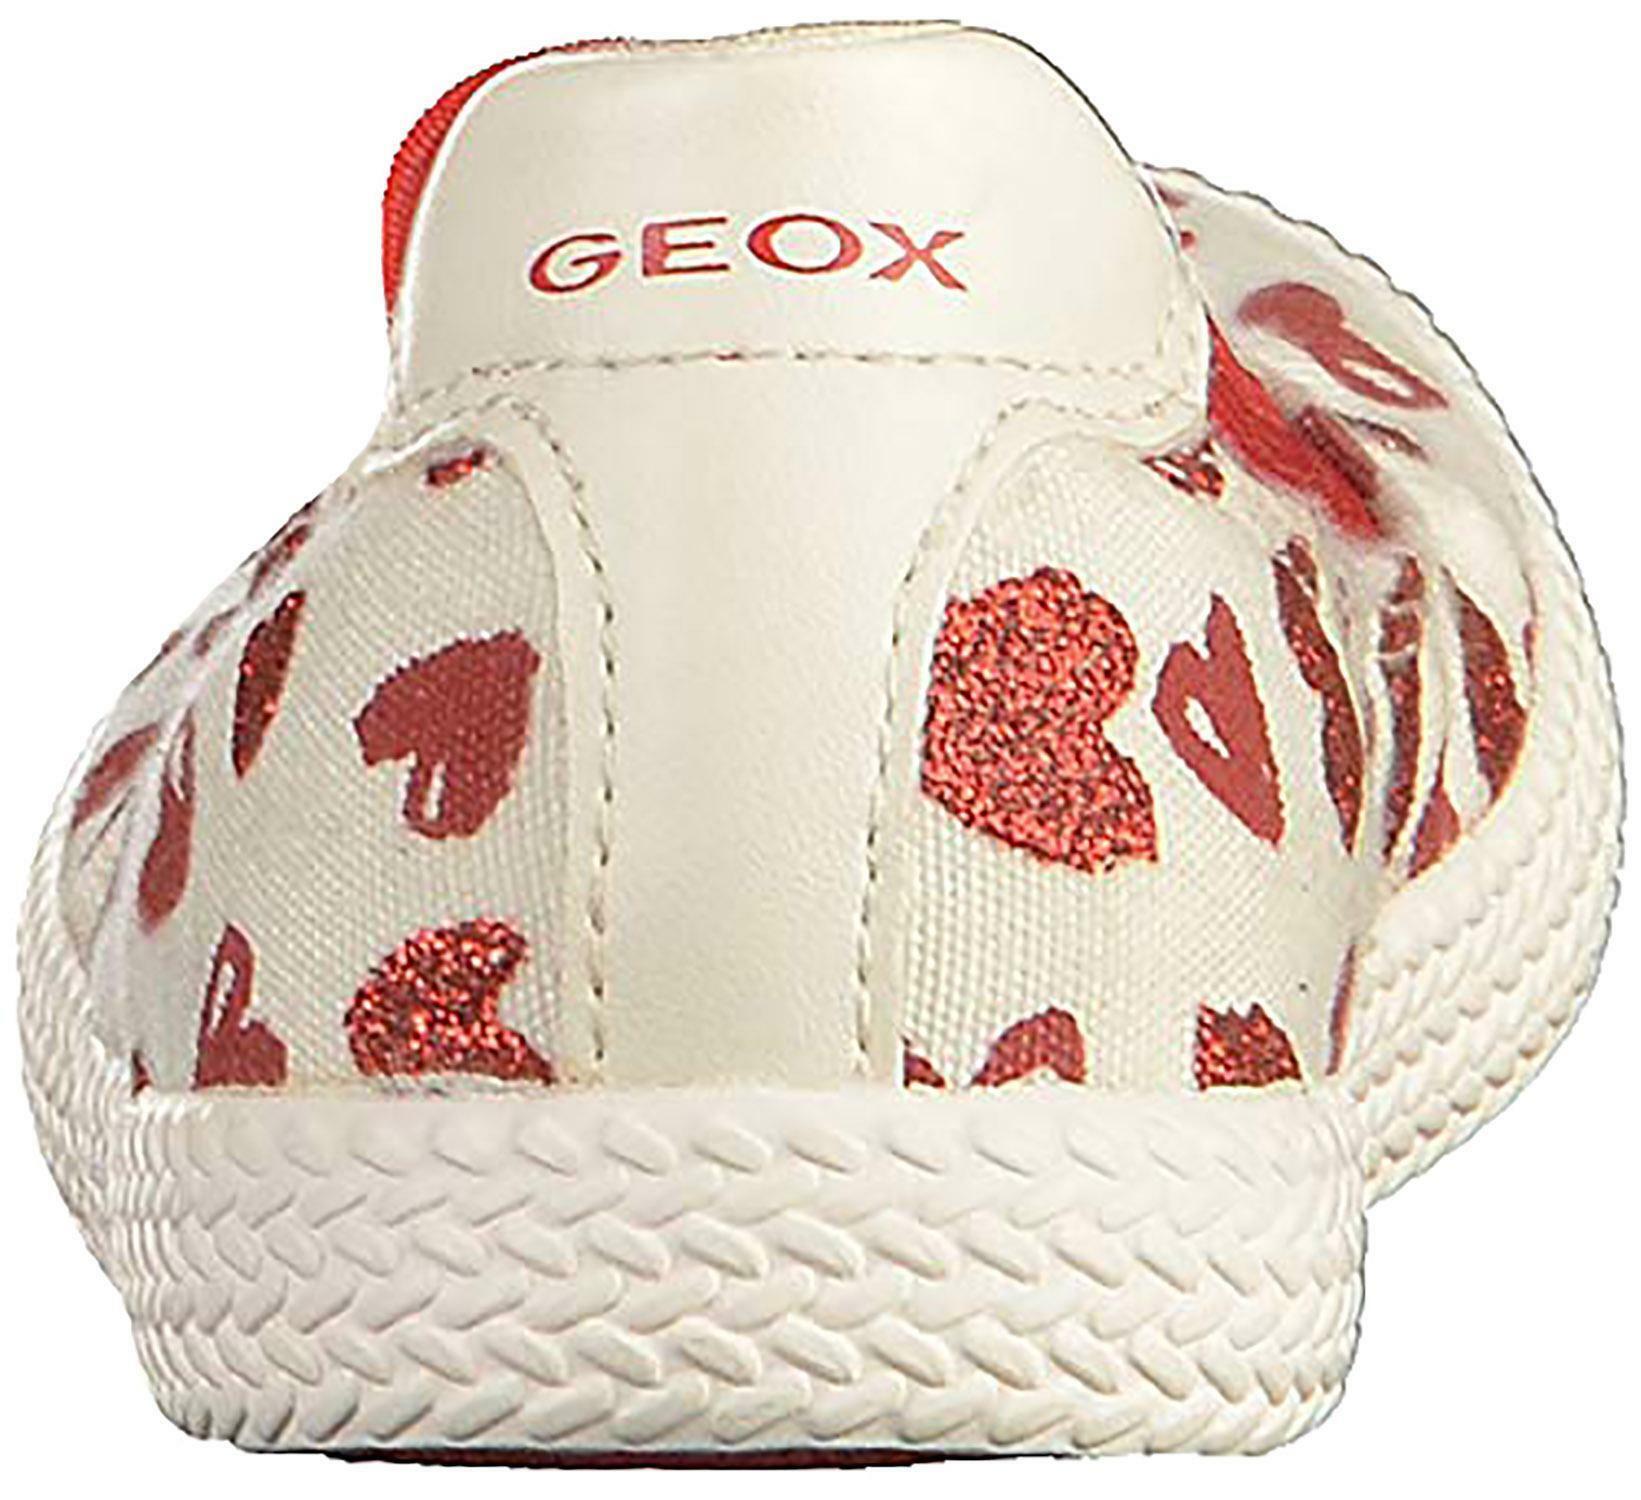 geox j kilwi g ballerine bambina bianche j92d5jc0050